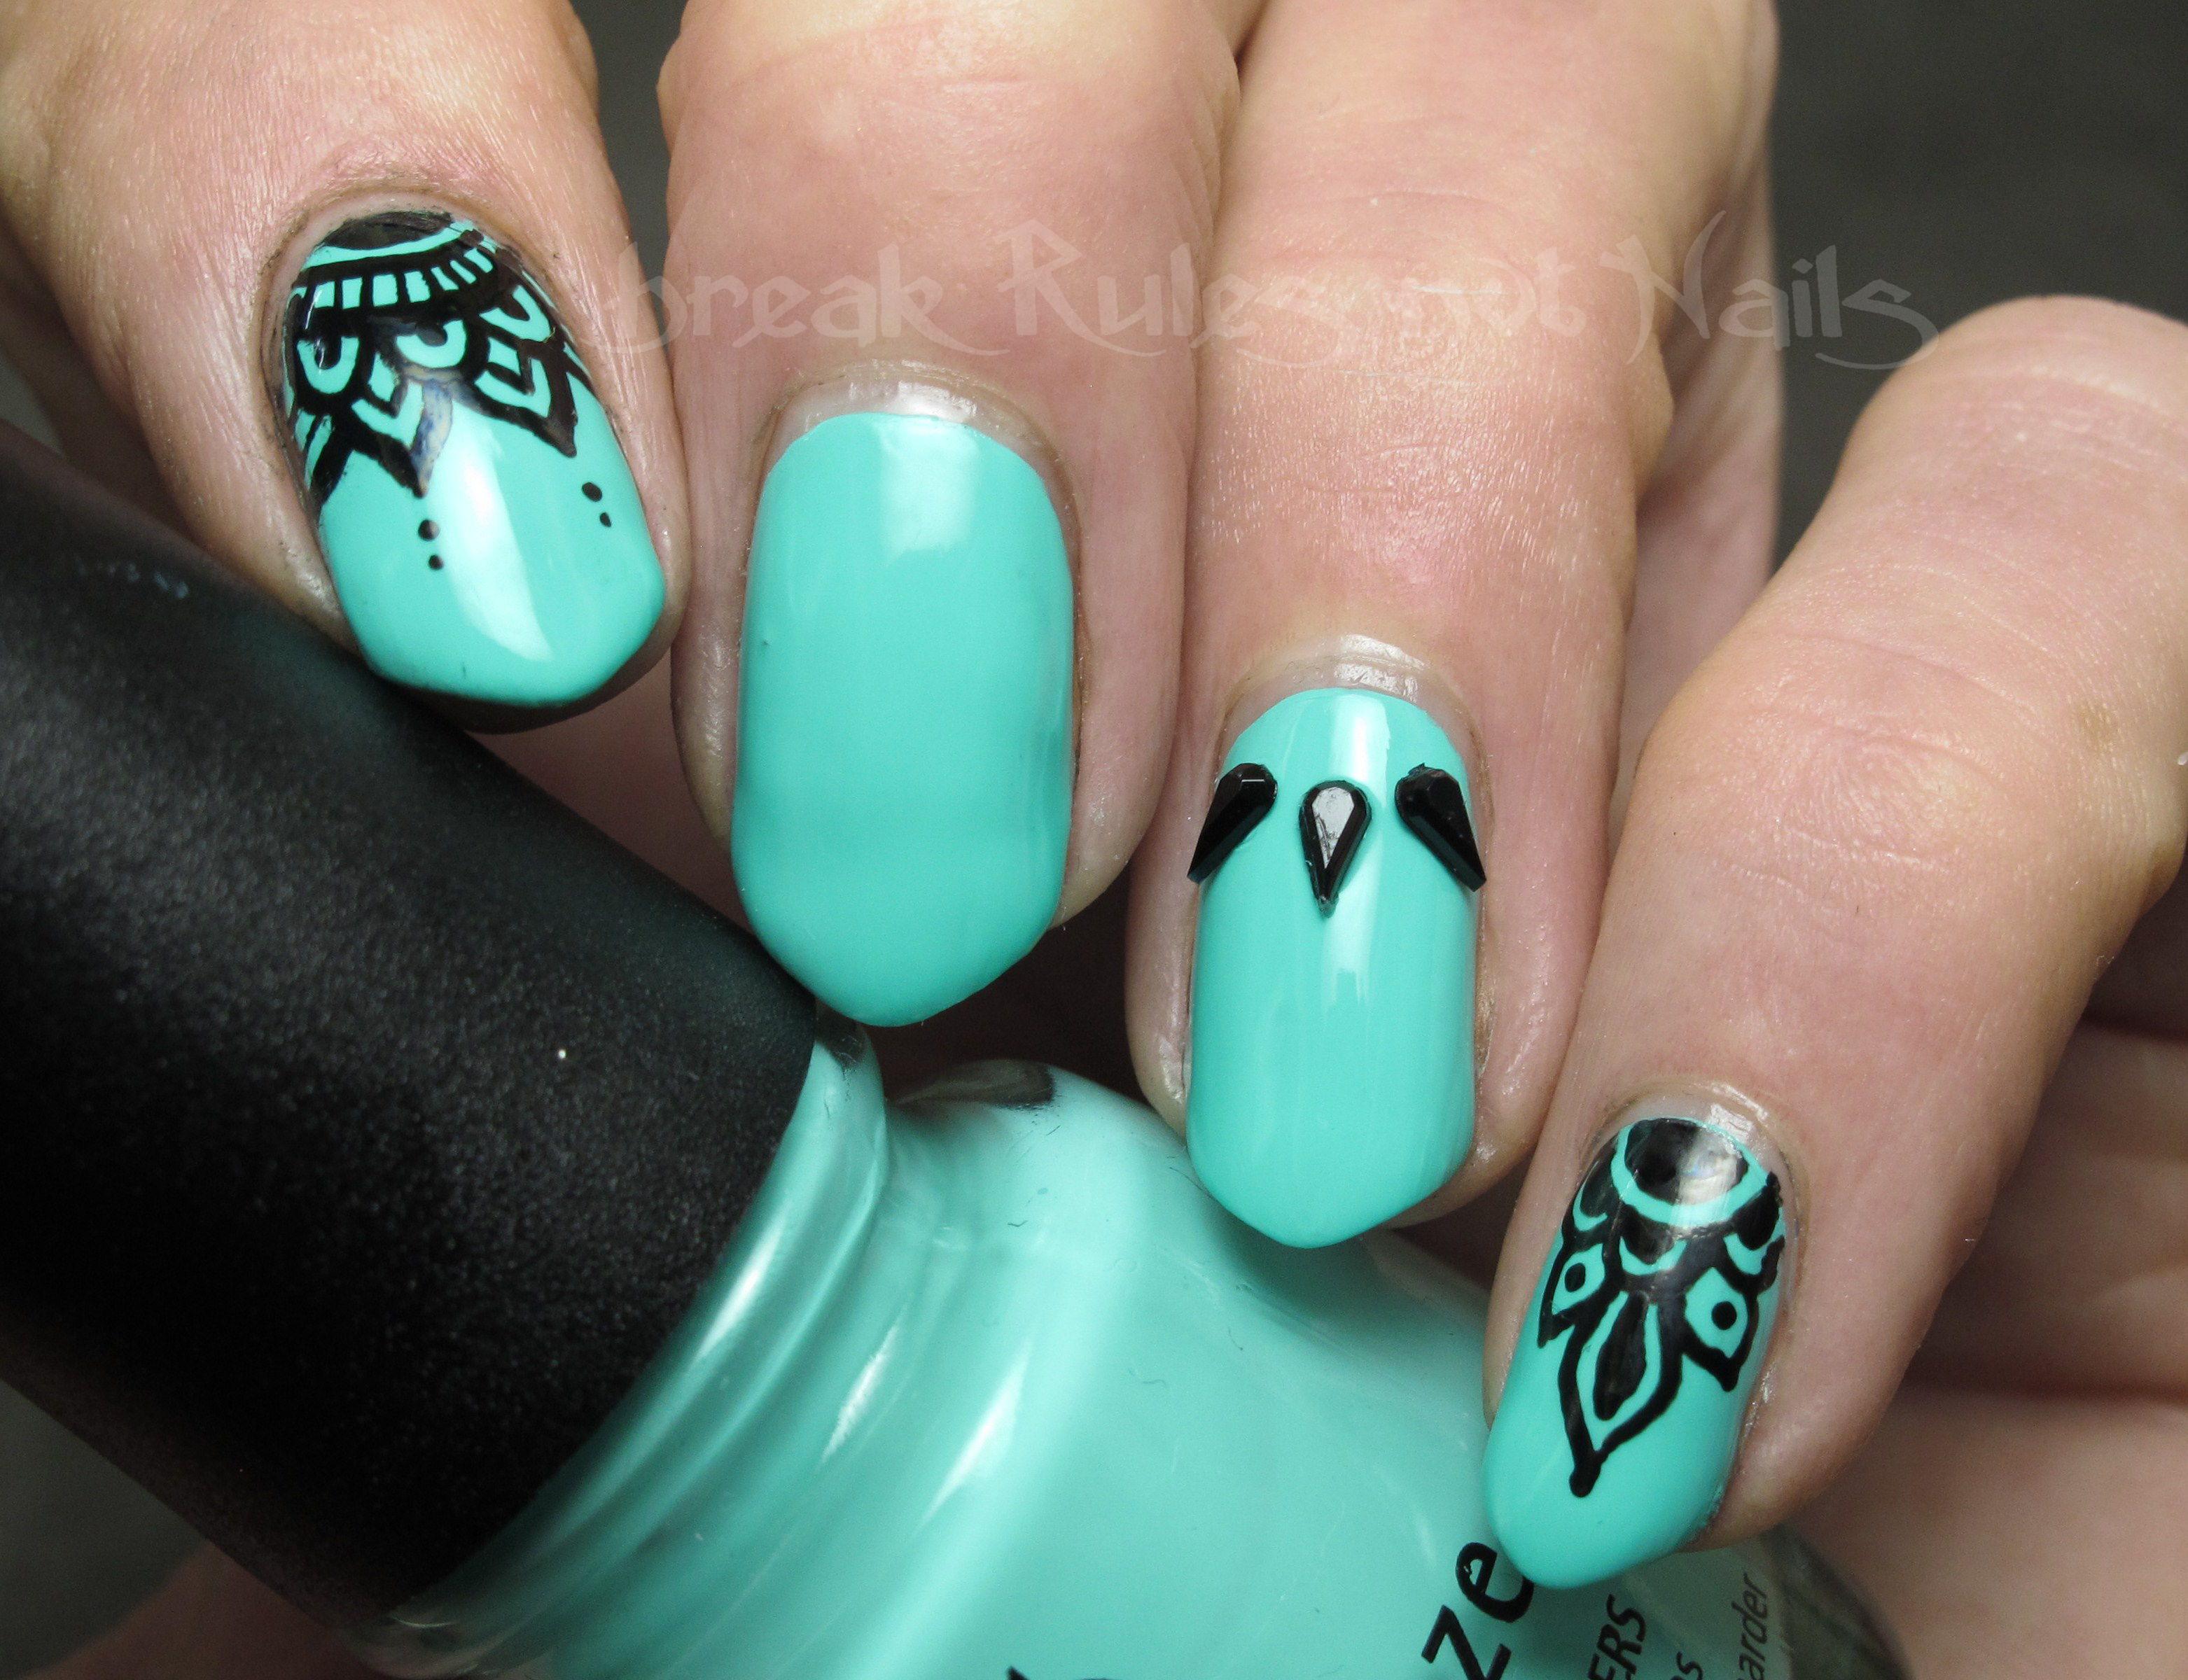 half nail colour - Google Search | Nails | Pinterest | Nail envy ...